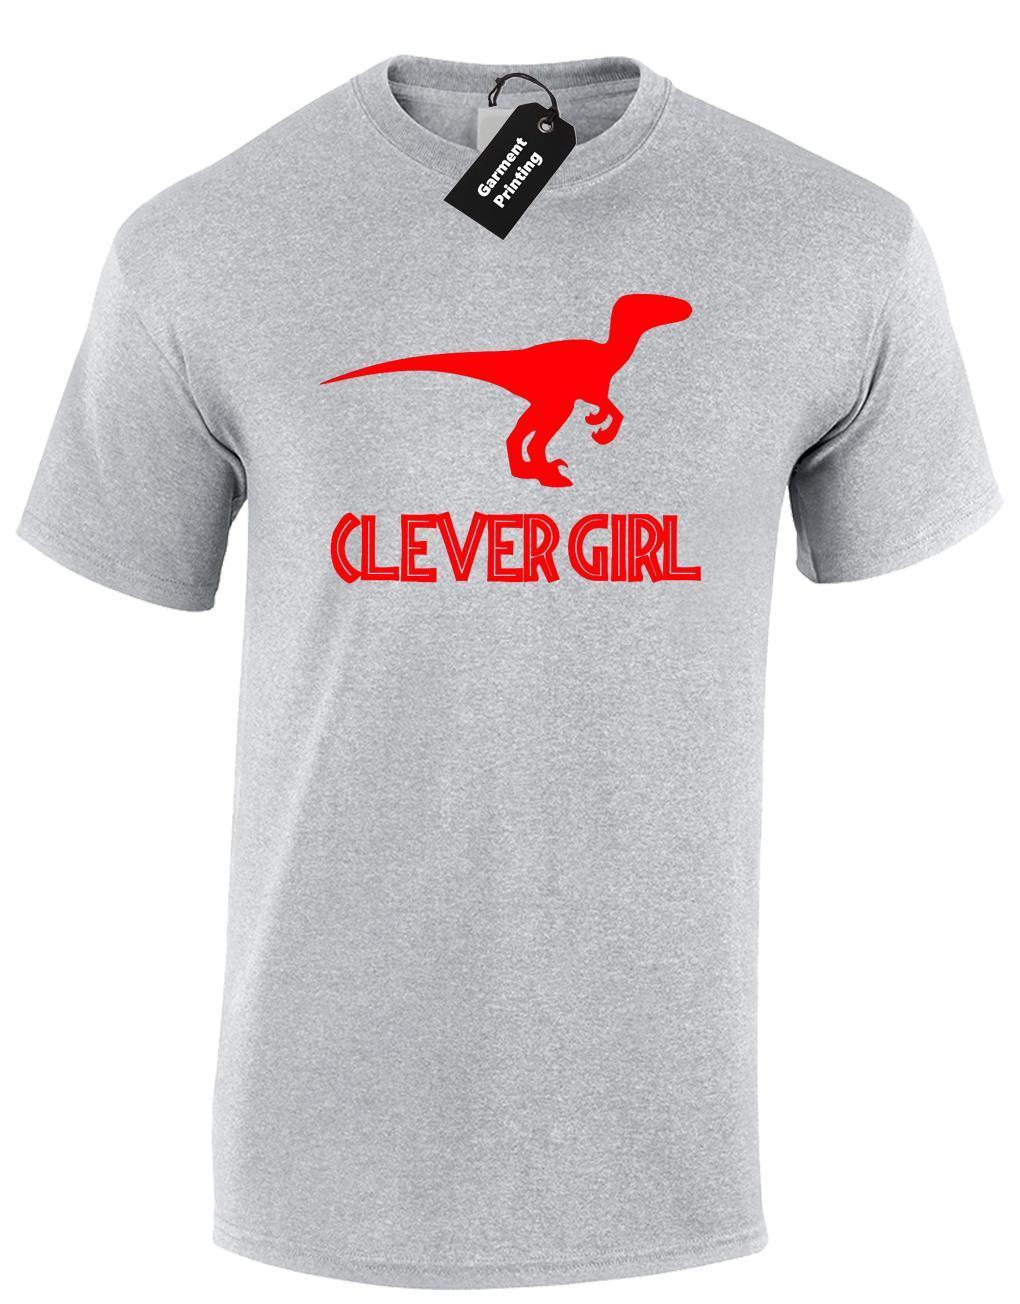 1240f15d3 CLEVER GIRL MENS T SHIRT COOL DINOSAUR JURASSIC RAPTOR PARK DESIGN RETRO  FILM Tee Shirts Mens T Shirts From Lijian19, $12.08  DHgate.Com